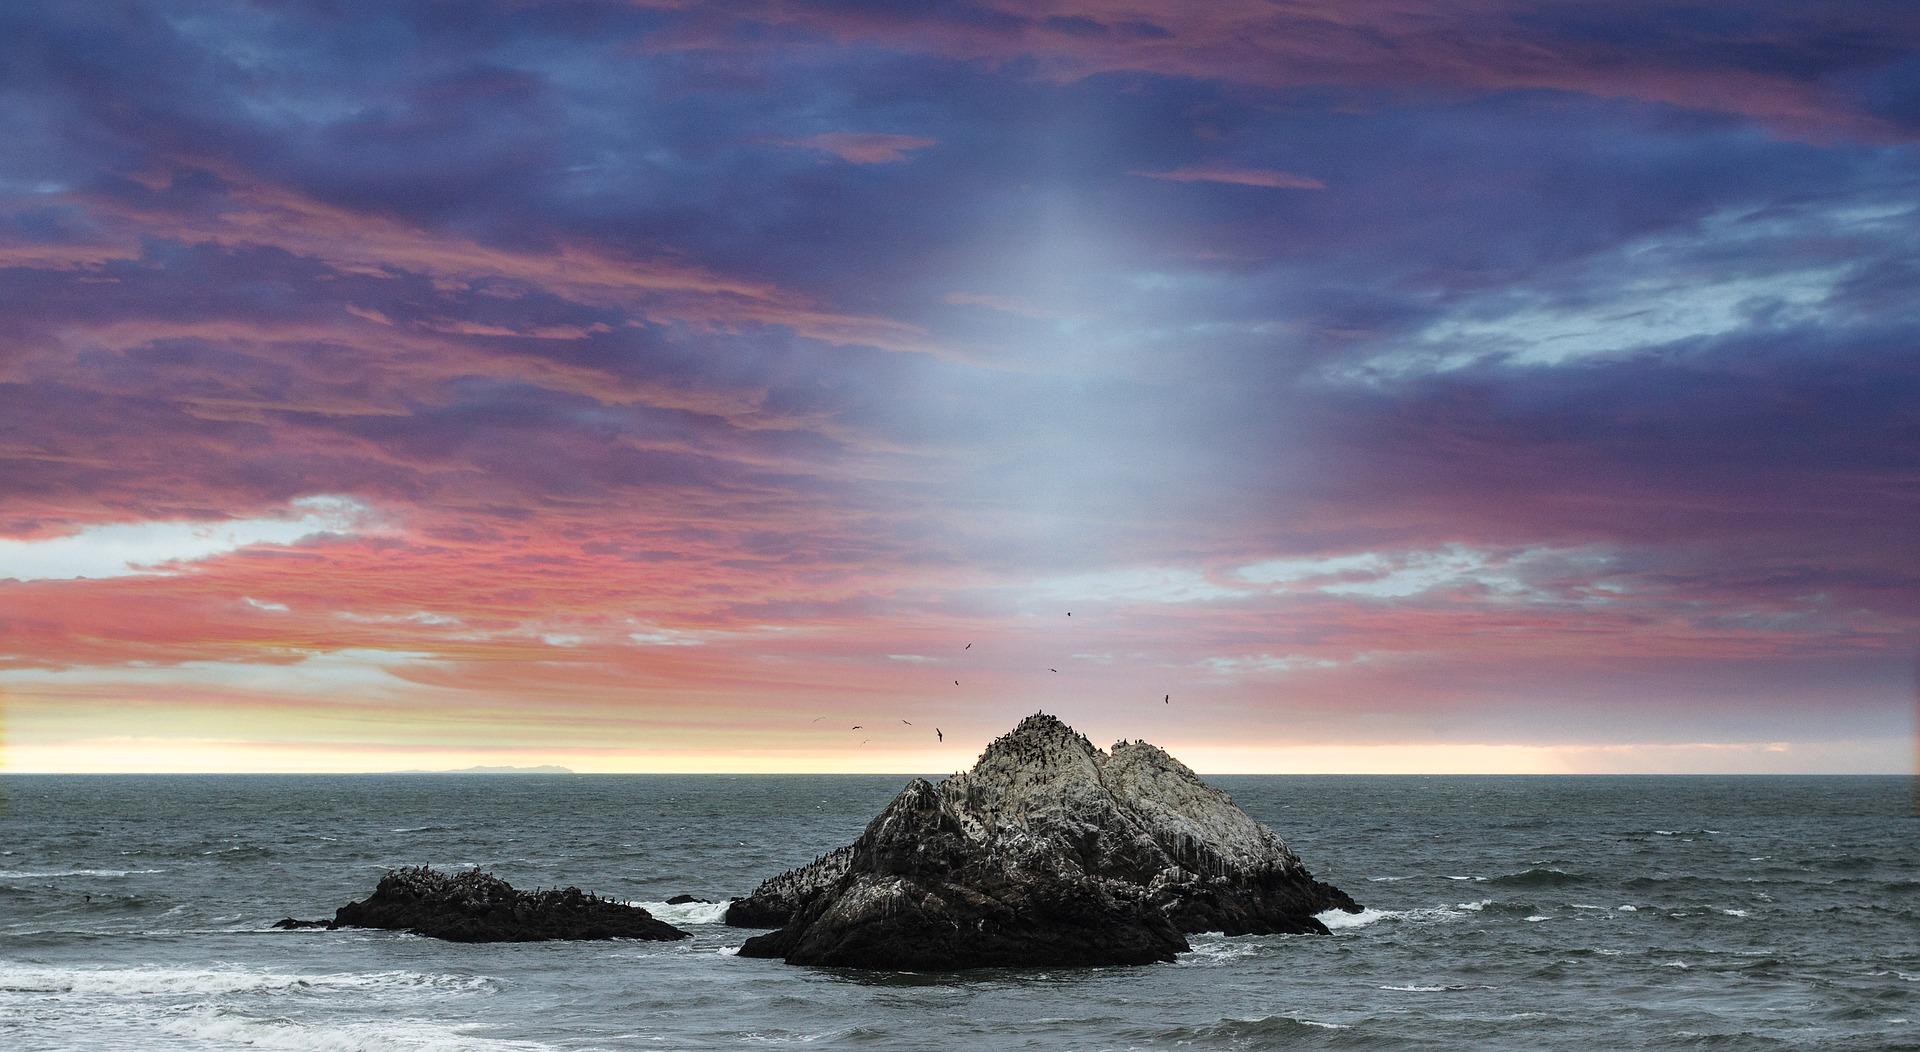 coastline-1698983_1920